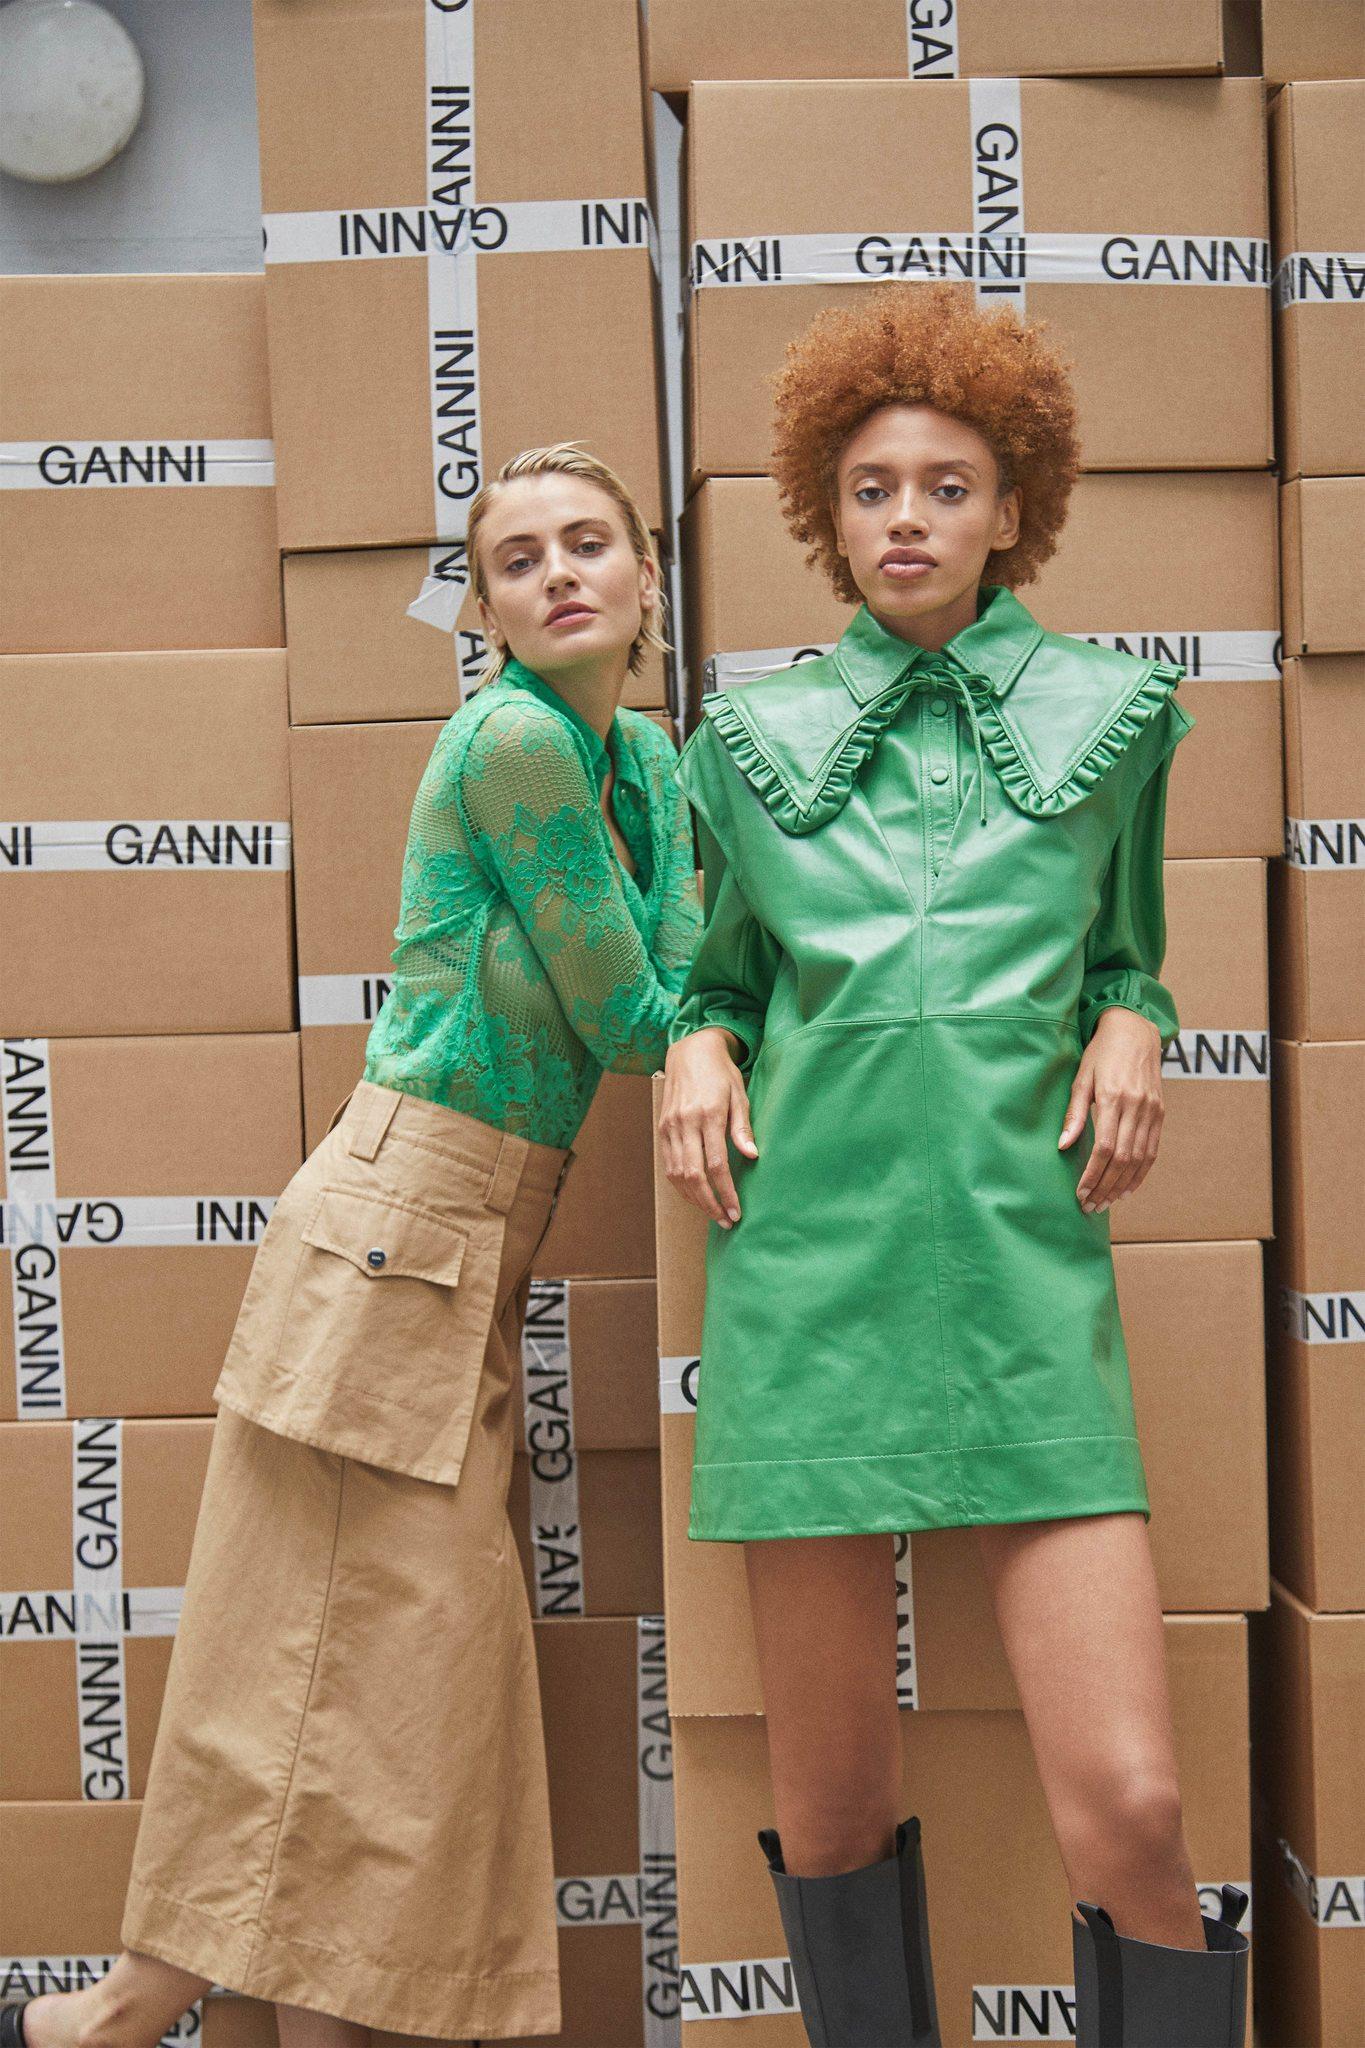 Copenhagen Fashion Week goes digital from 2 to 4 february